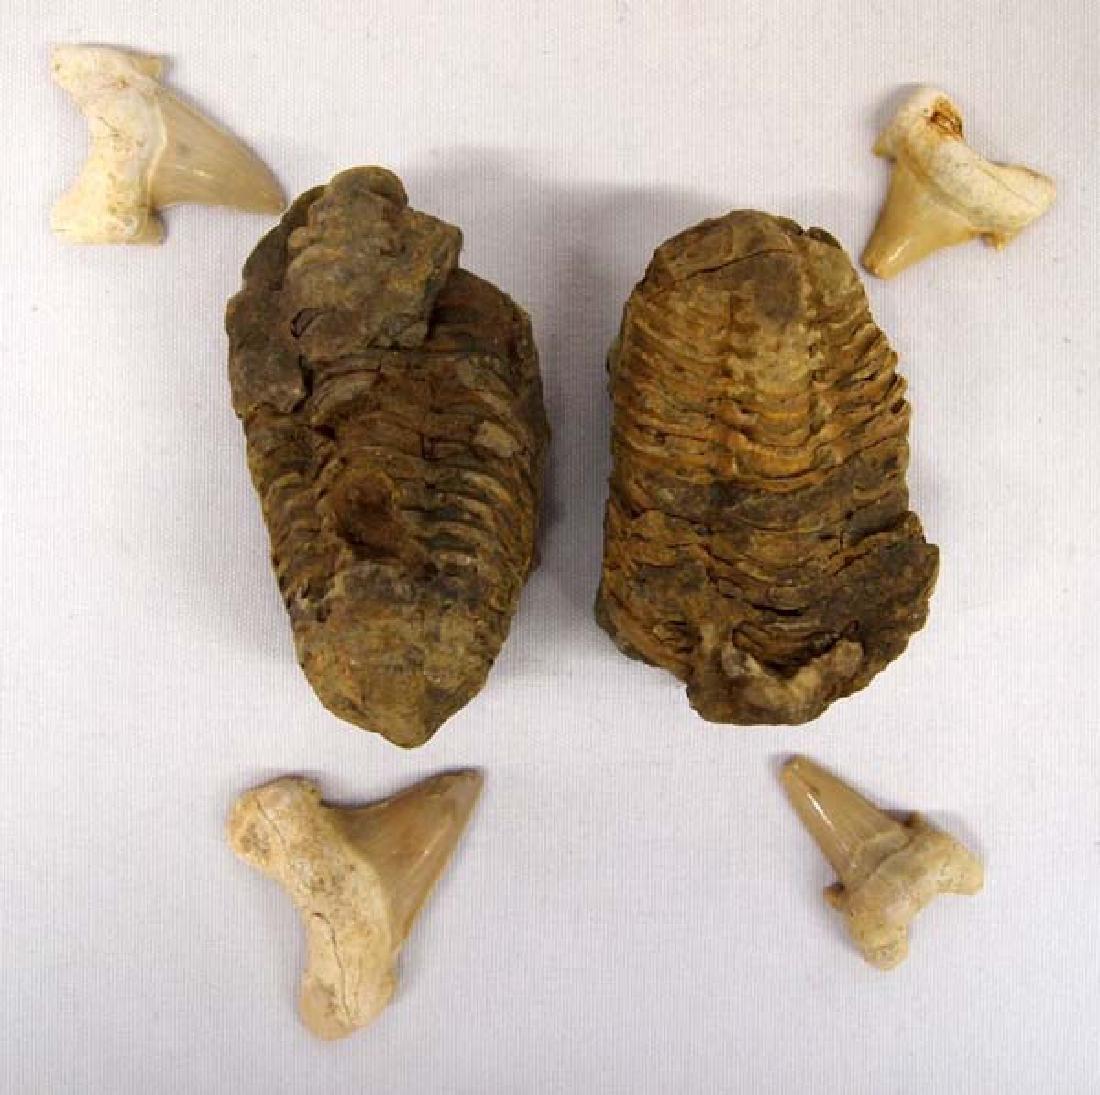 2 Trilobite Fossils & 4 Fossilized Shark's Teeth